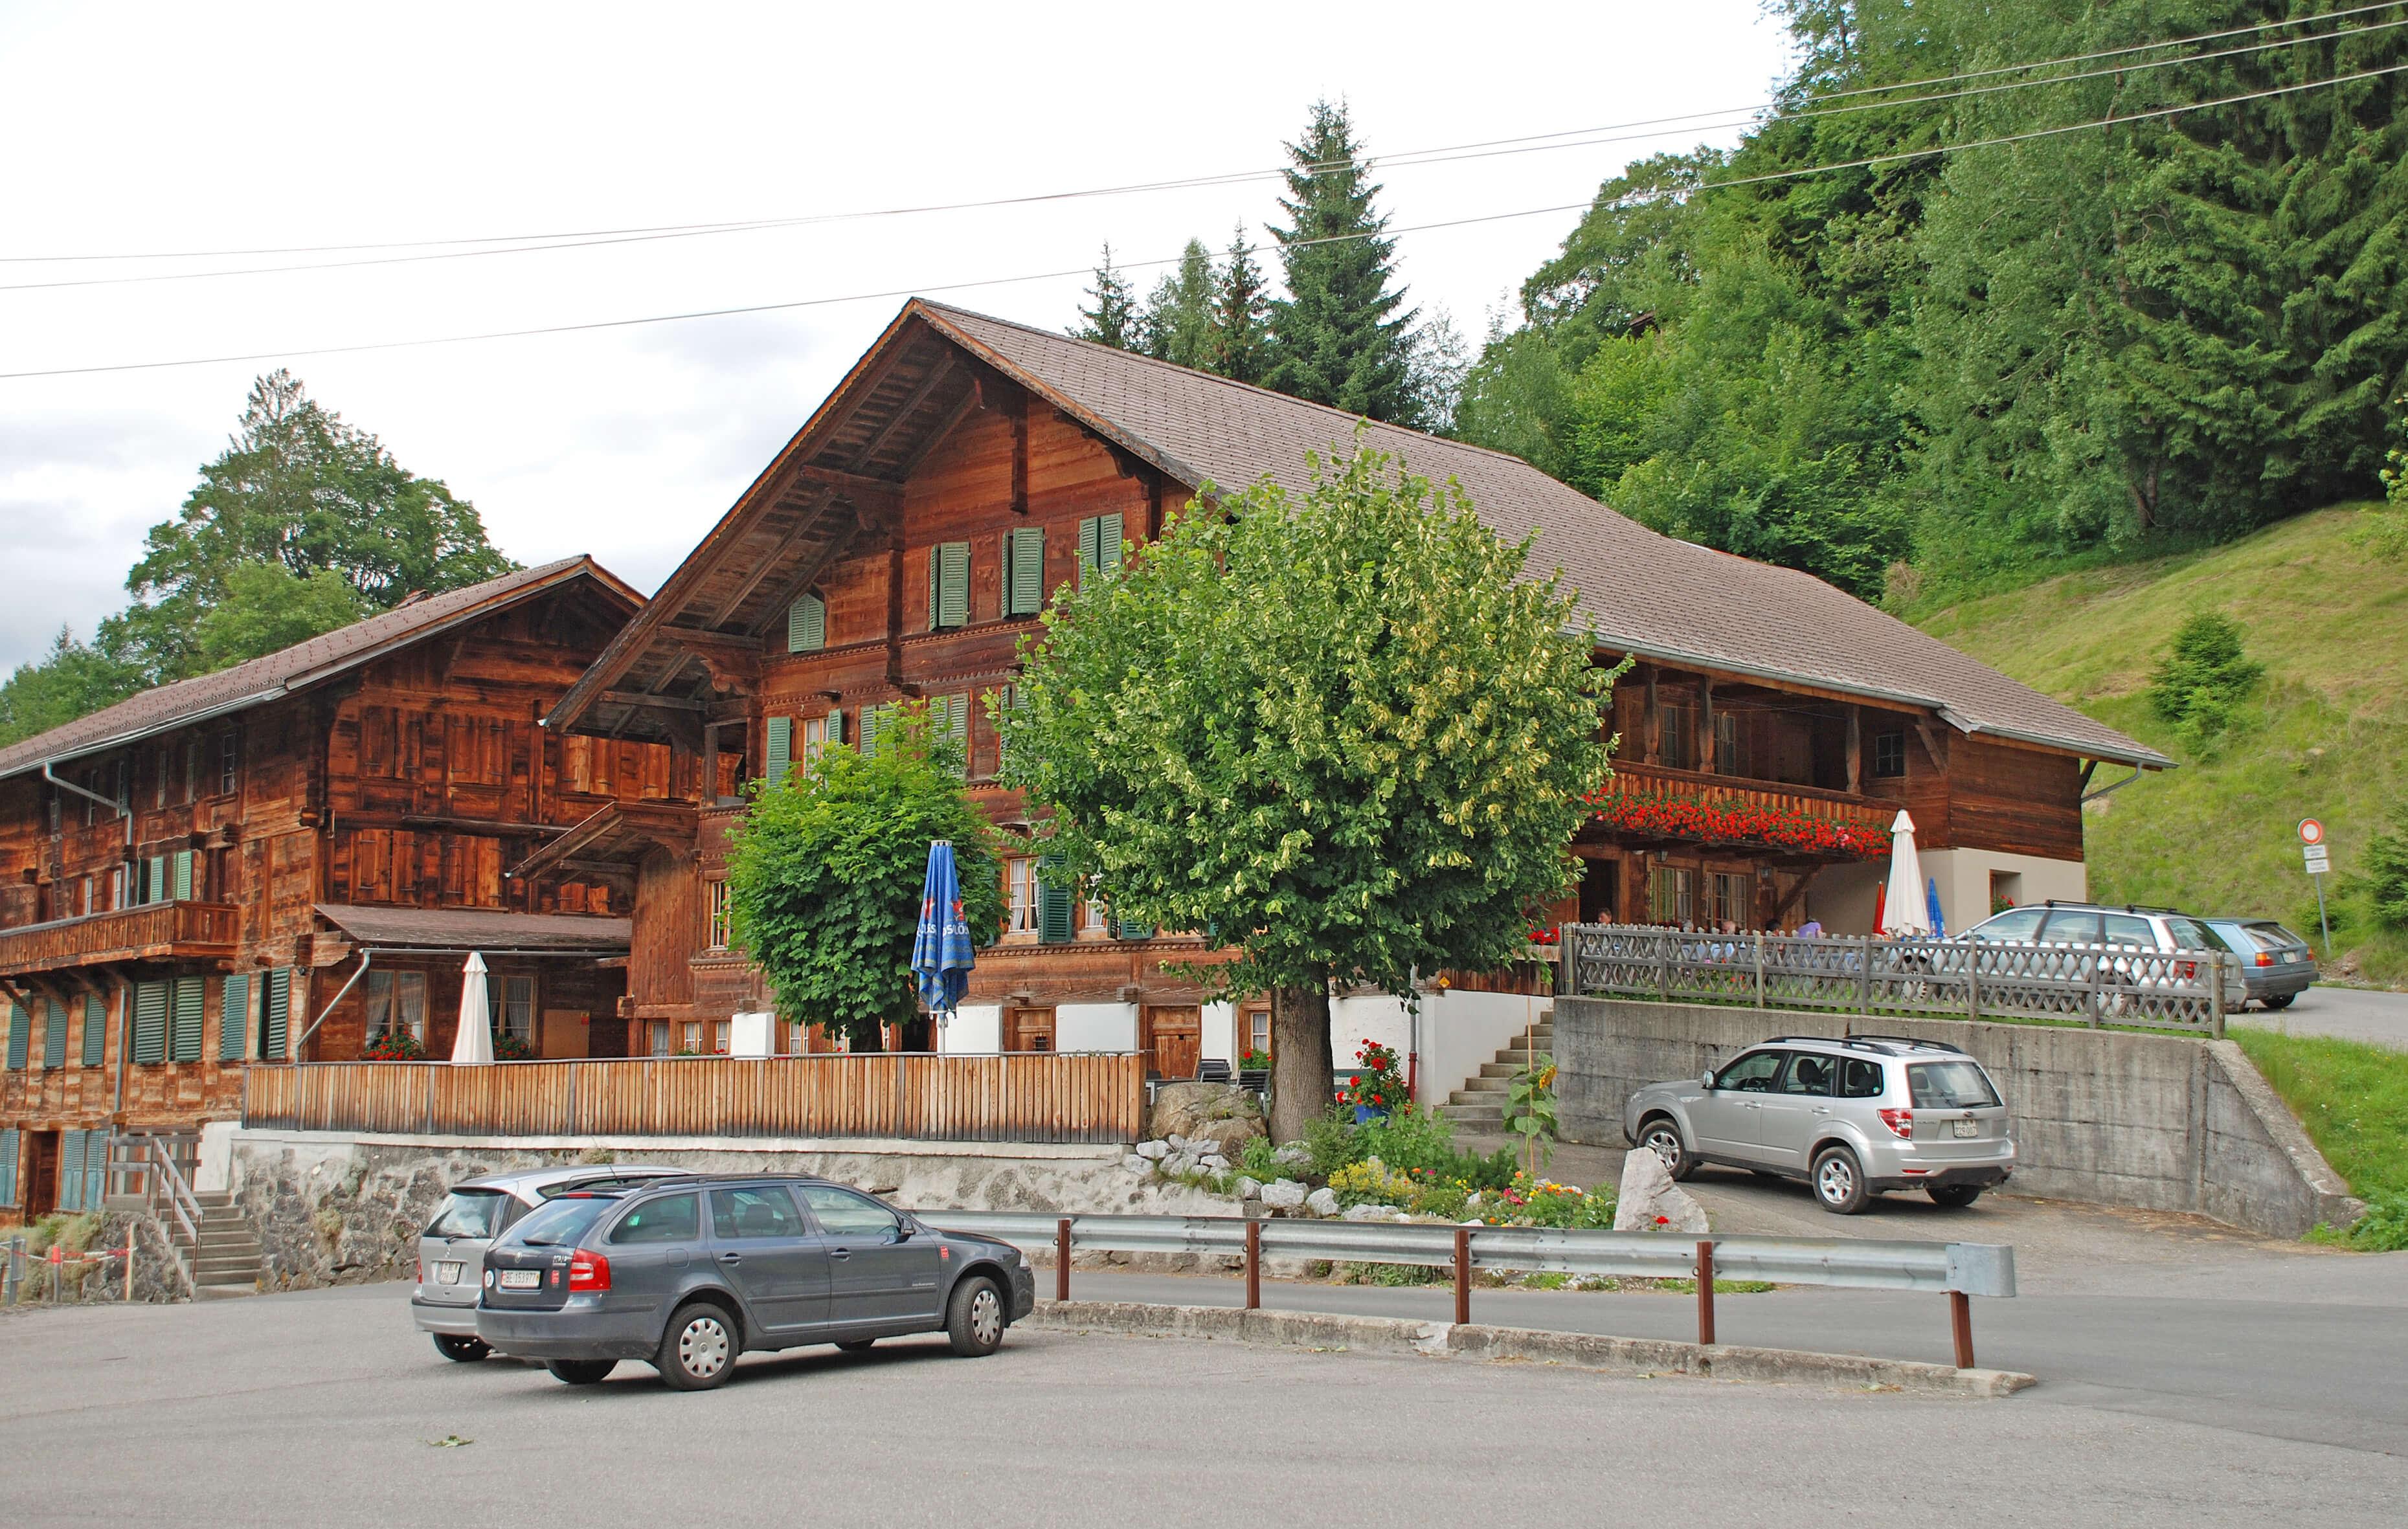 Gasthof Rothbad